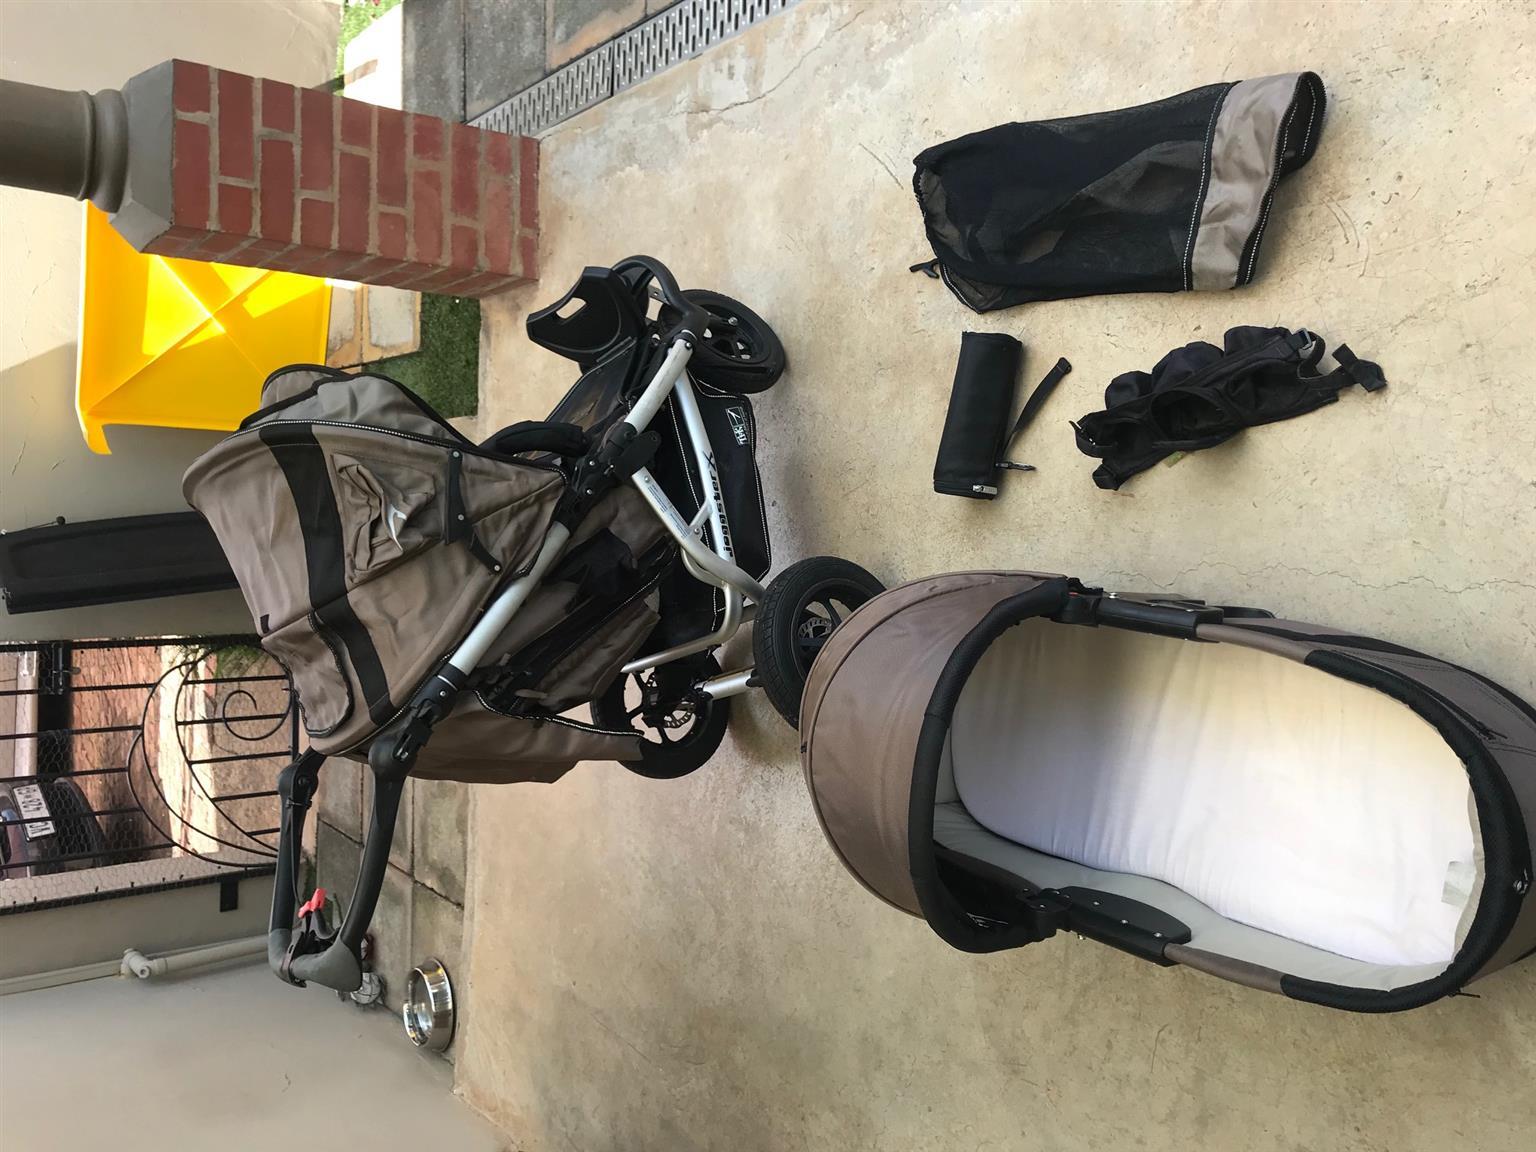 Baby Stuff - All you need